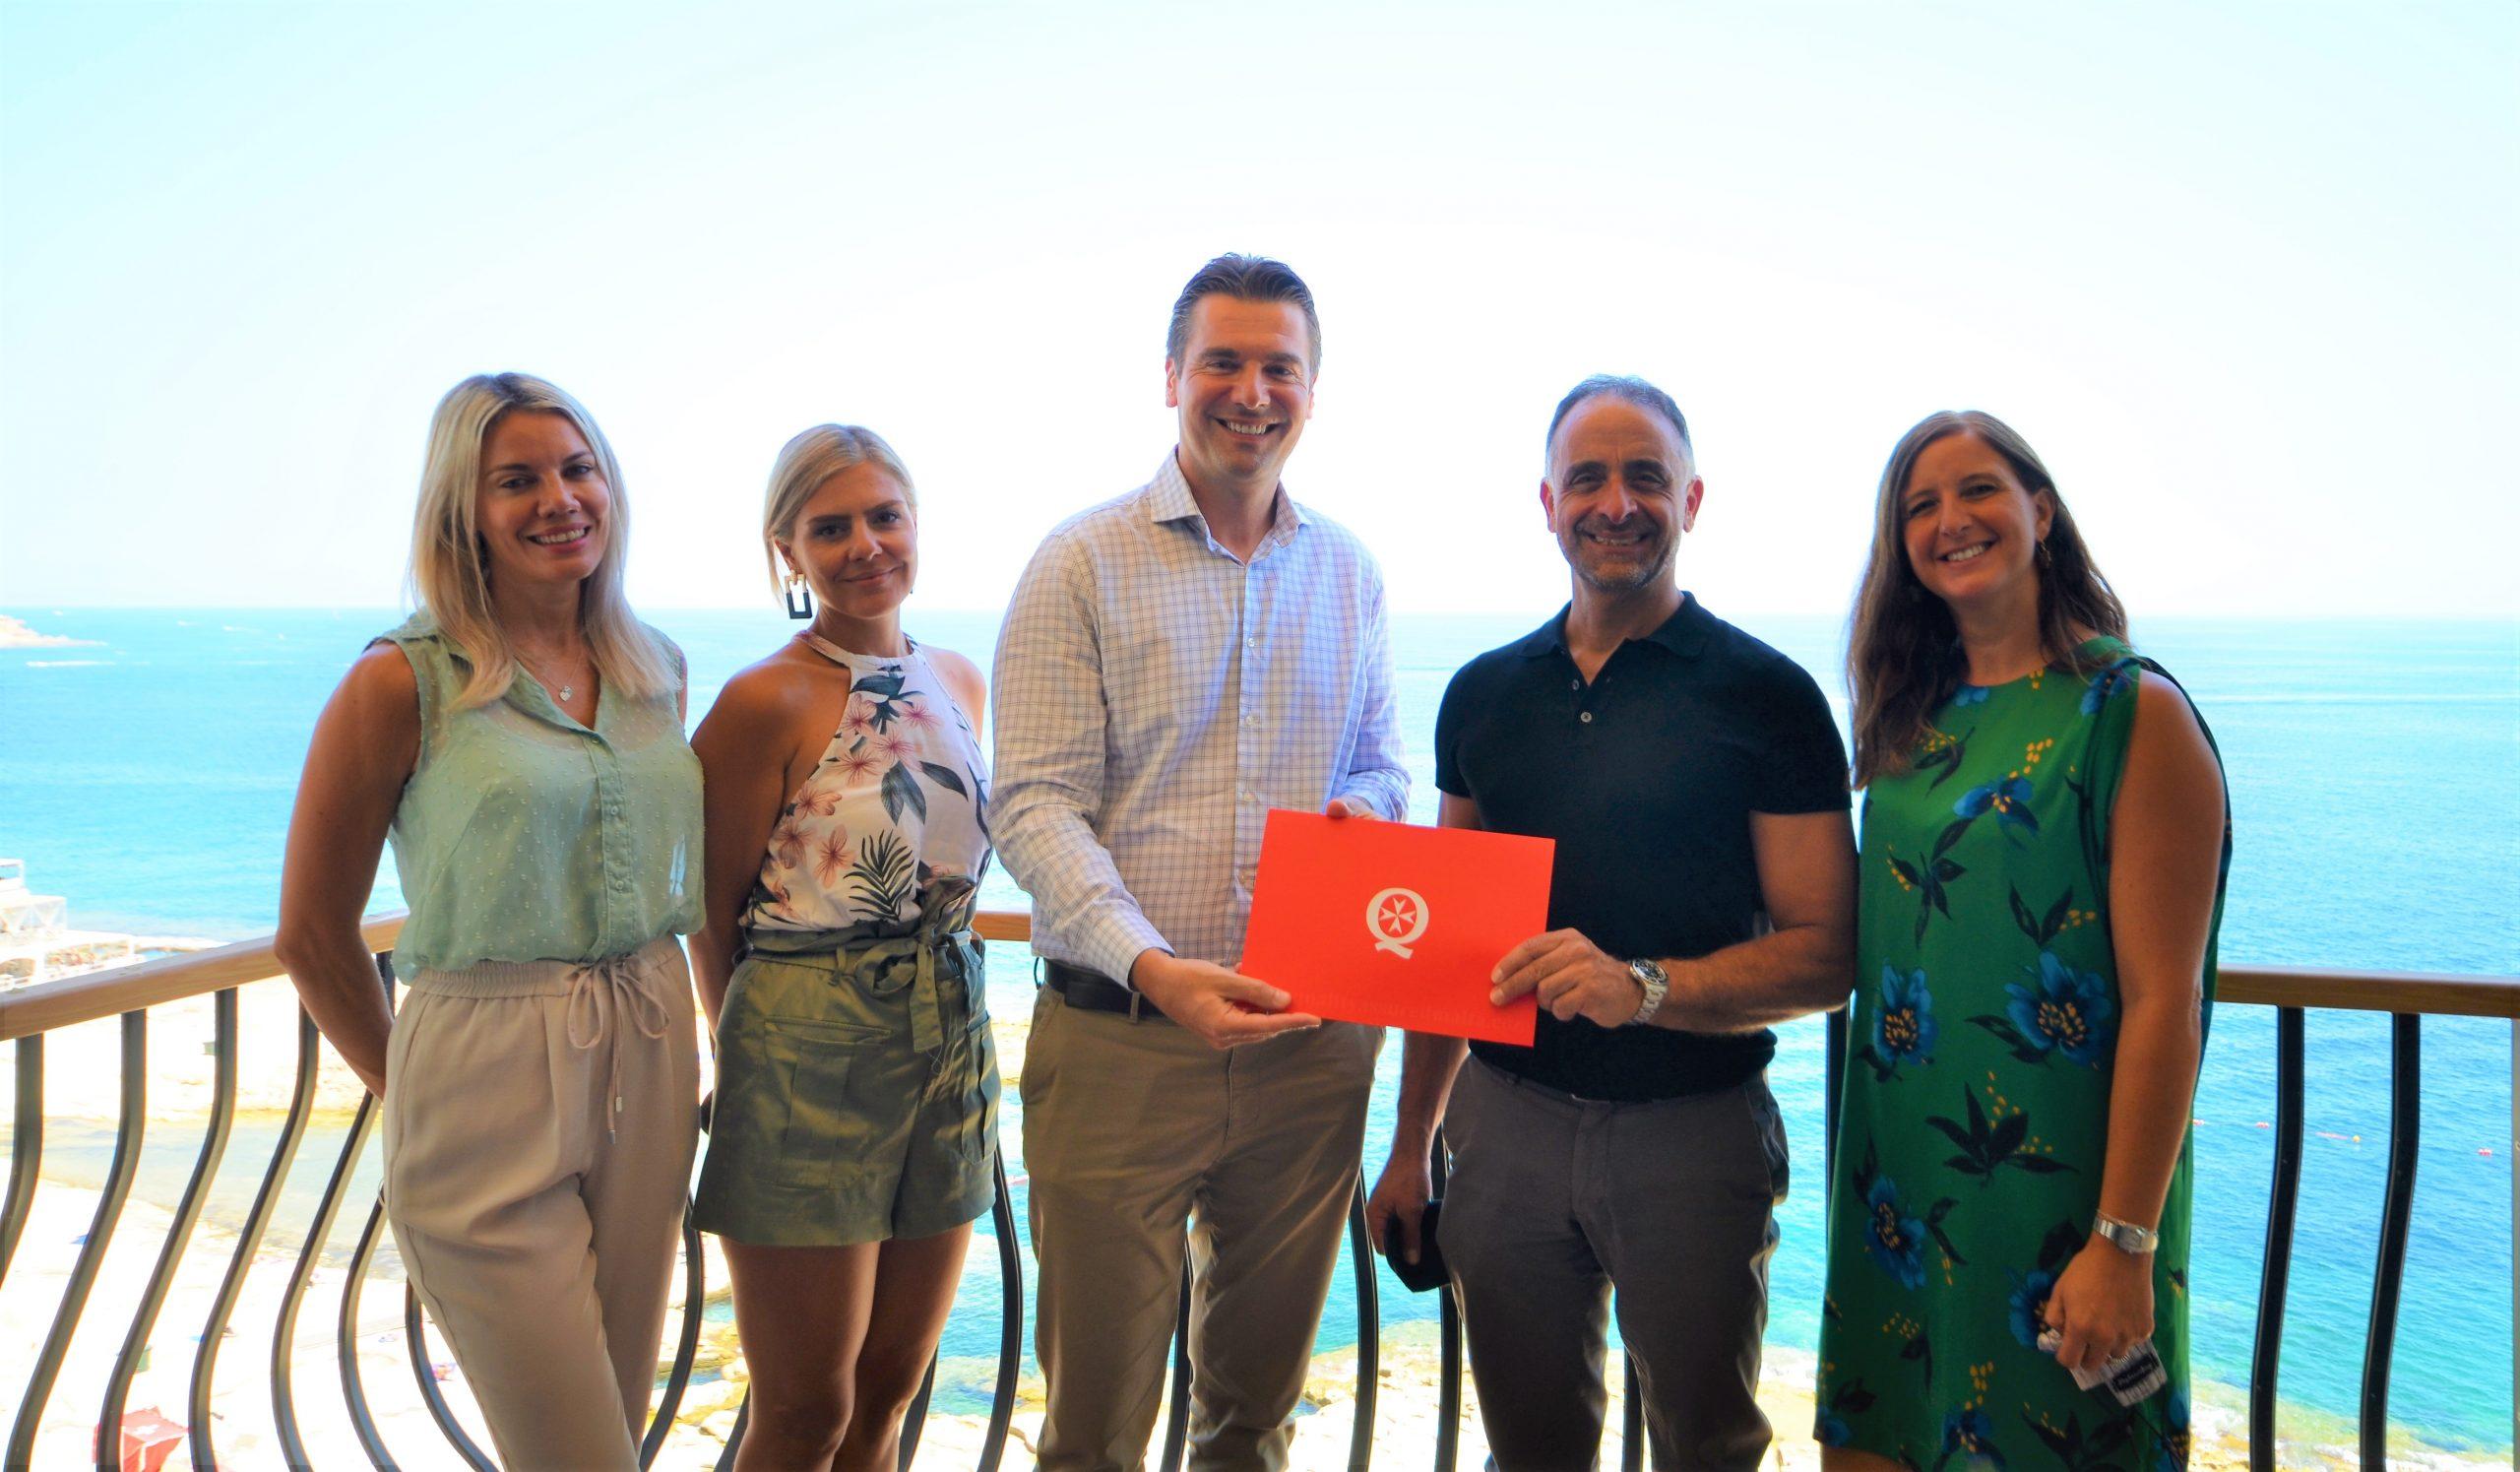 Colours of Malta receives the QA seal